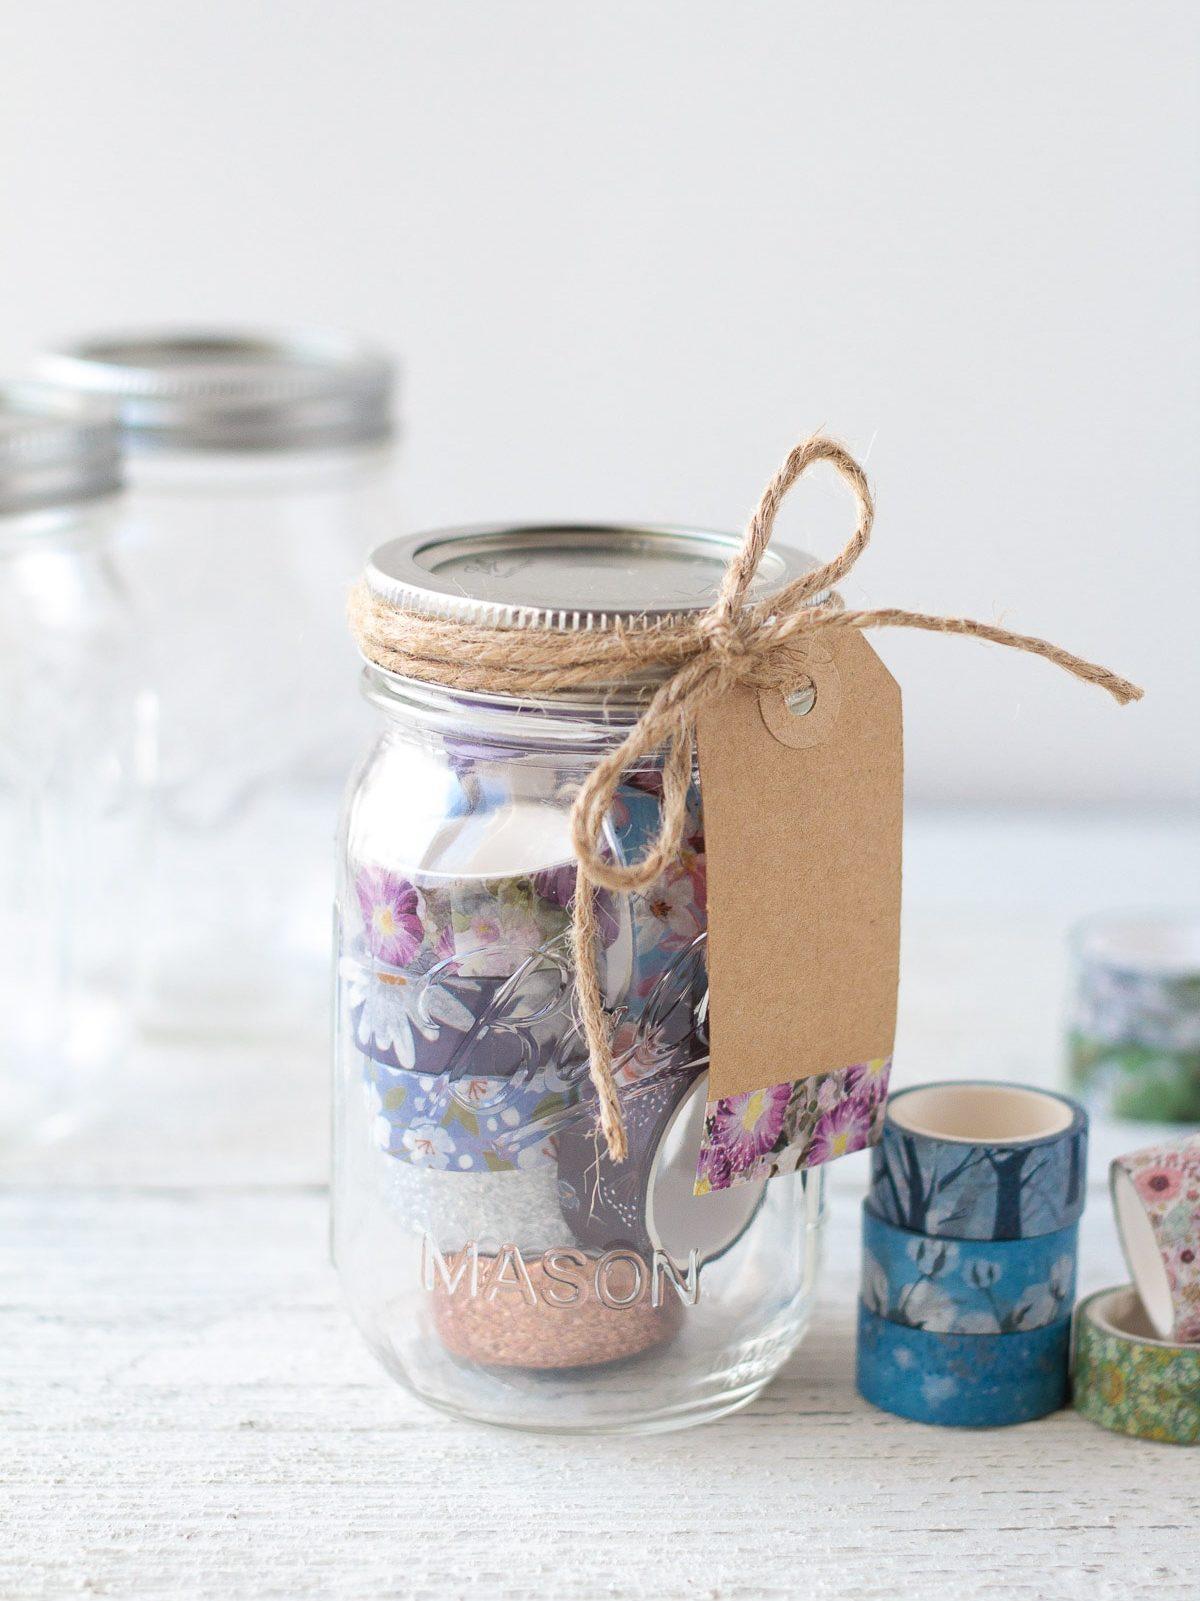 Mason jar washi tape gift idea tied with a gift tag.